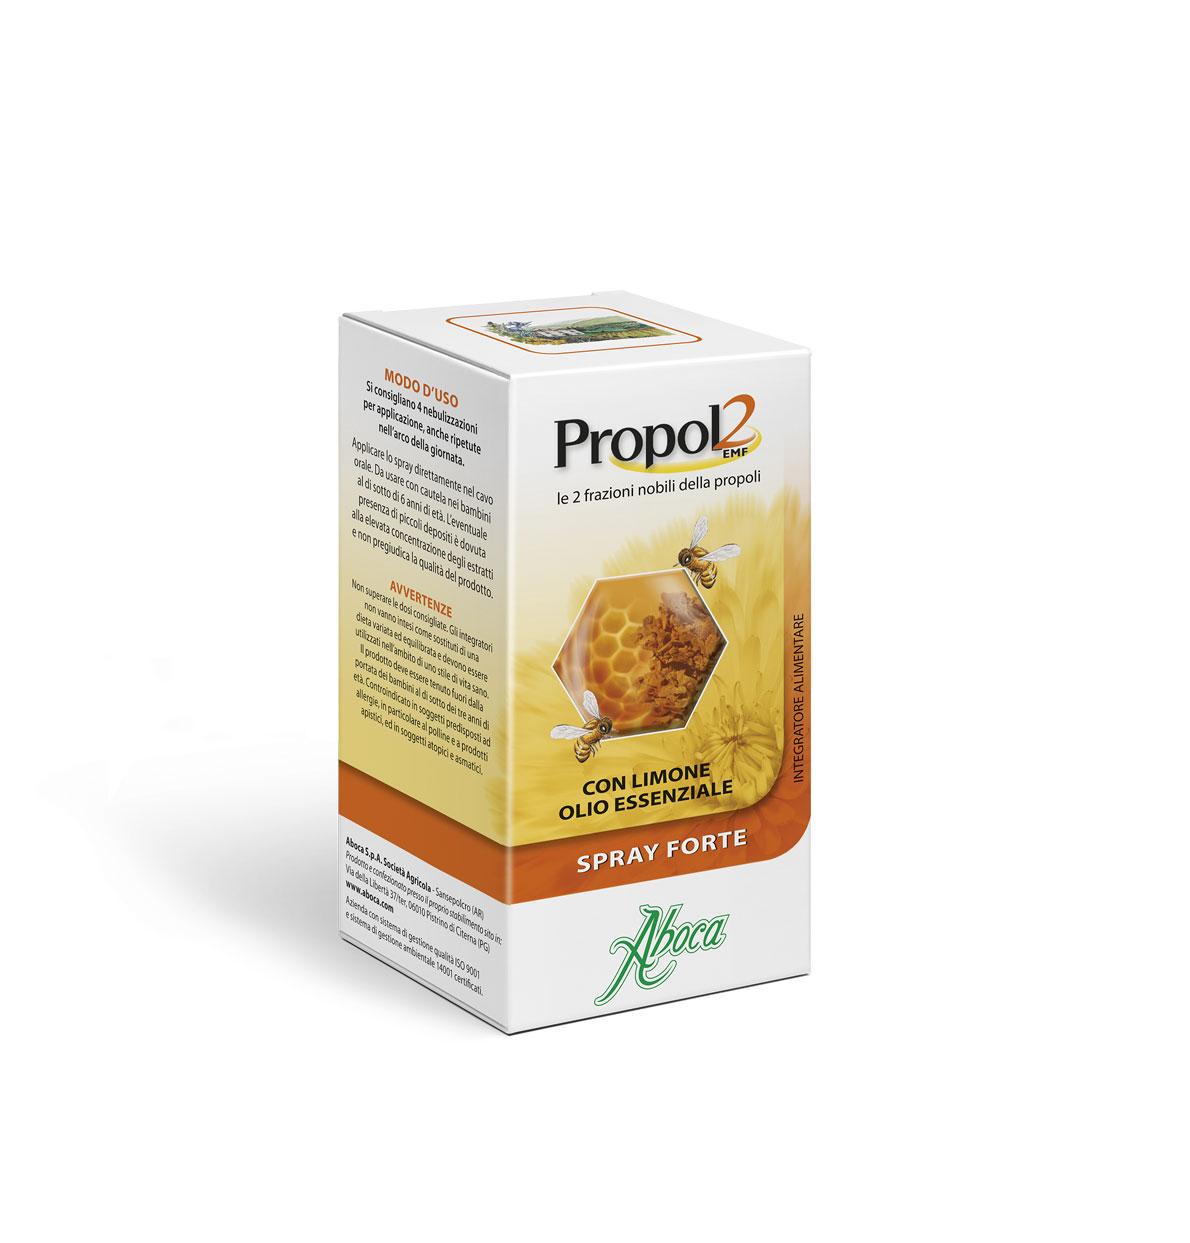 Propol2 Emf Spray Forte Aboca 30ml